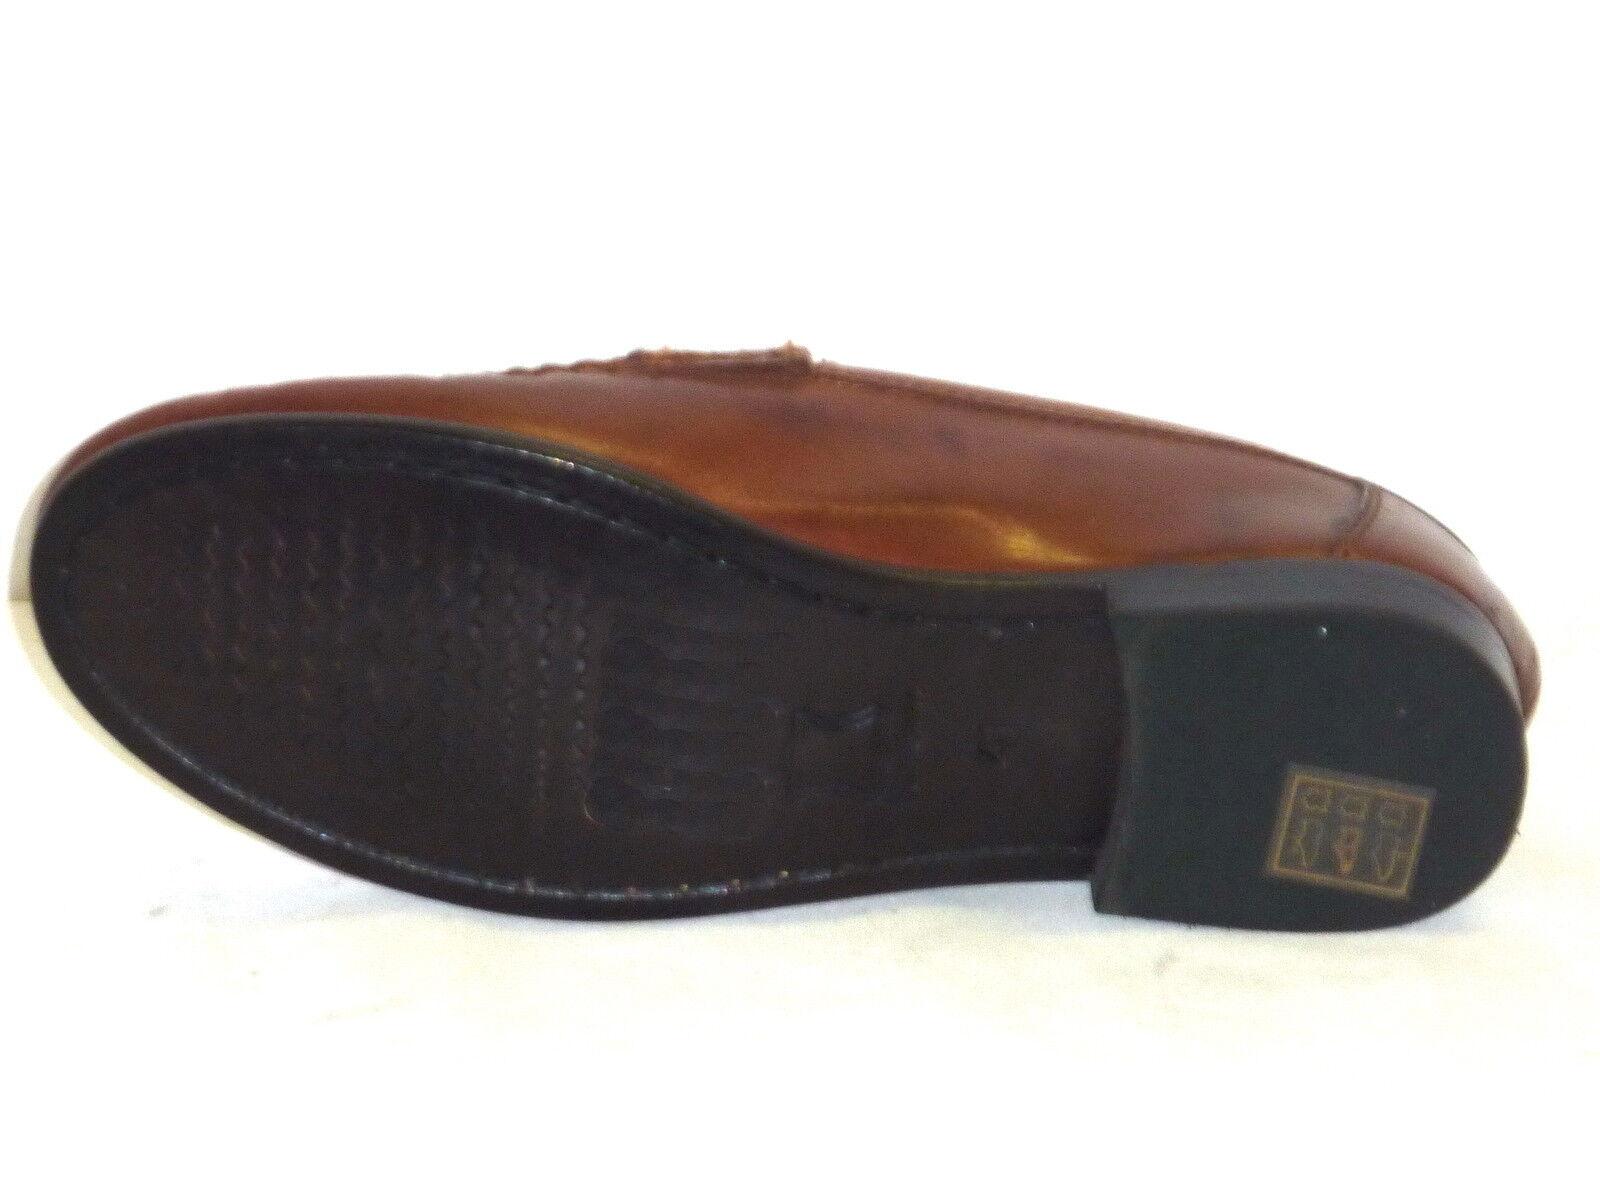 MOCASSINO Zapatos Zapatos hombre ELEGANTI PELLE PELLE PELLE MARRONE n.42 37acca